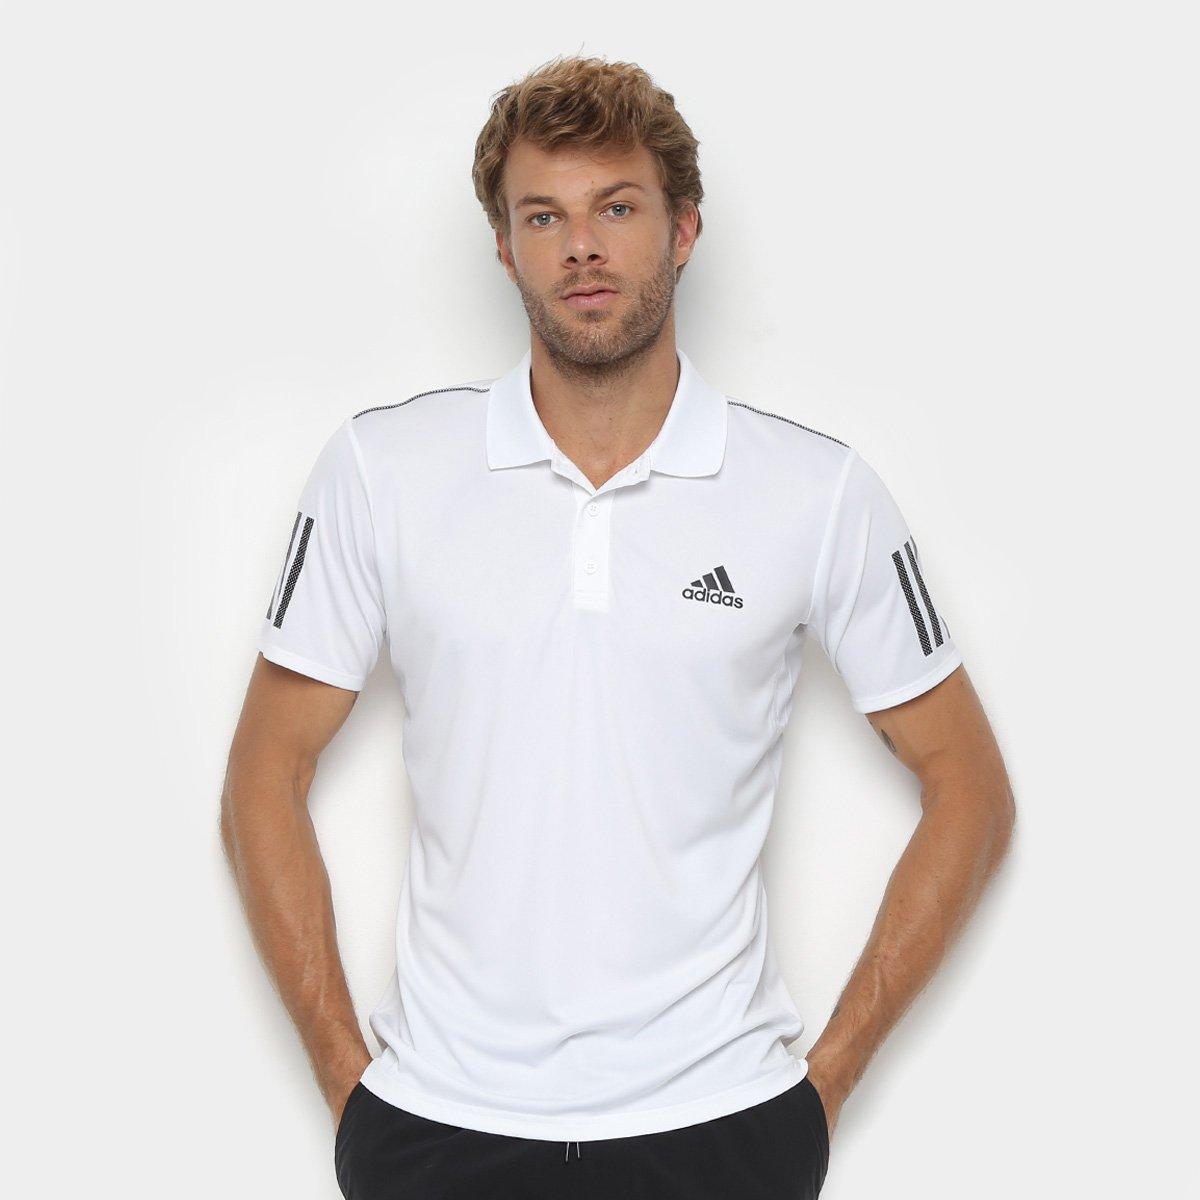 de8c5ceeb10 Camisa Polo Adidas Club 3 Stripes Masculina